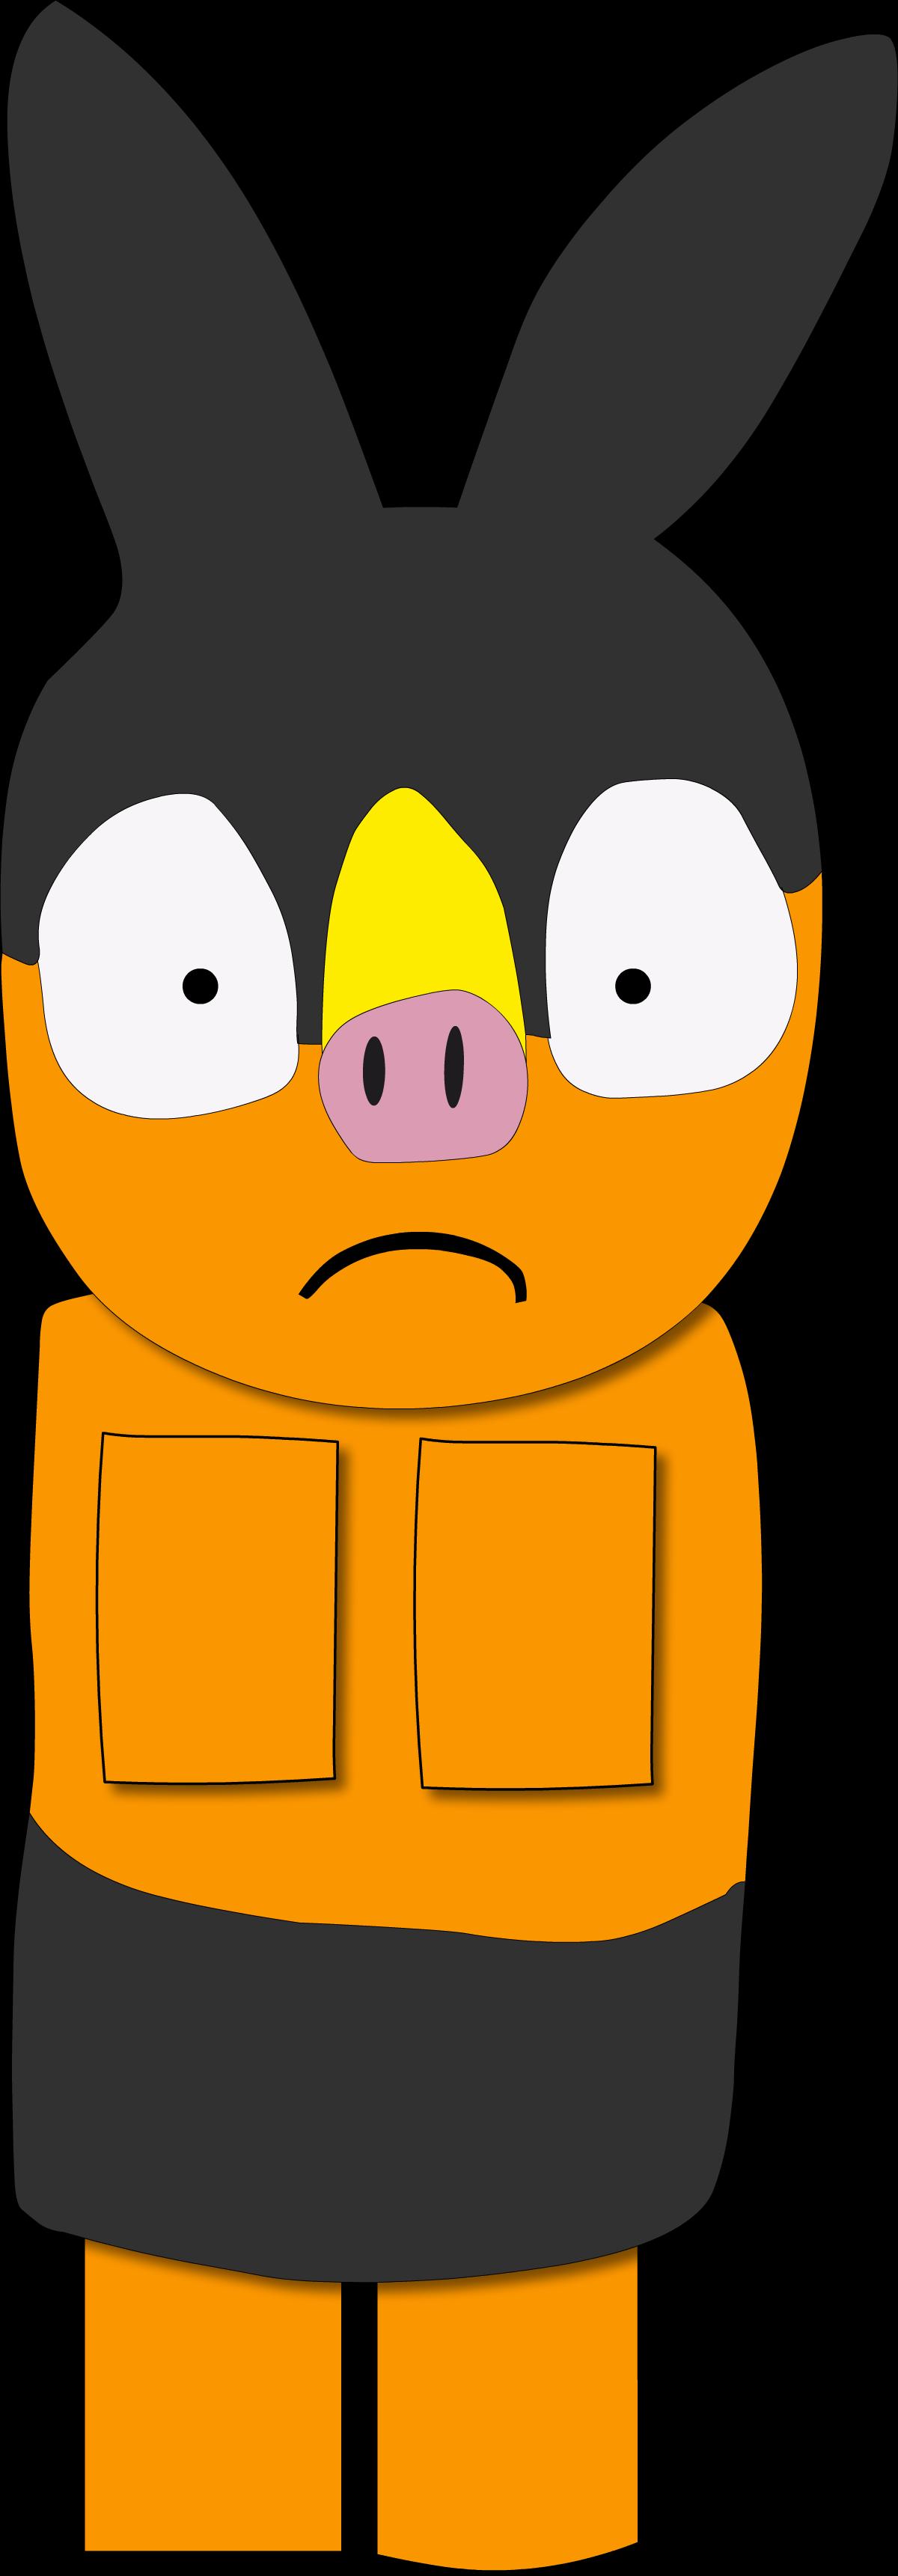 Category:The Wonder Pets | The Parody Wiki | FANDOM